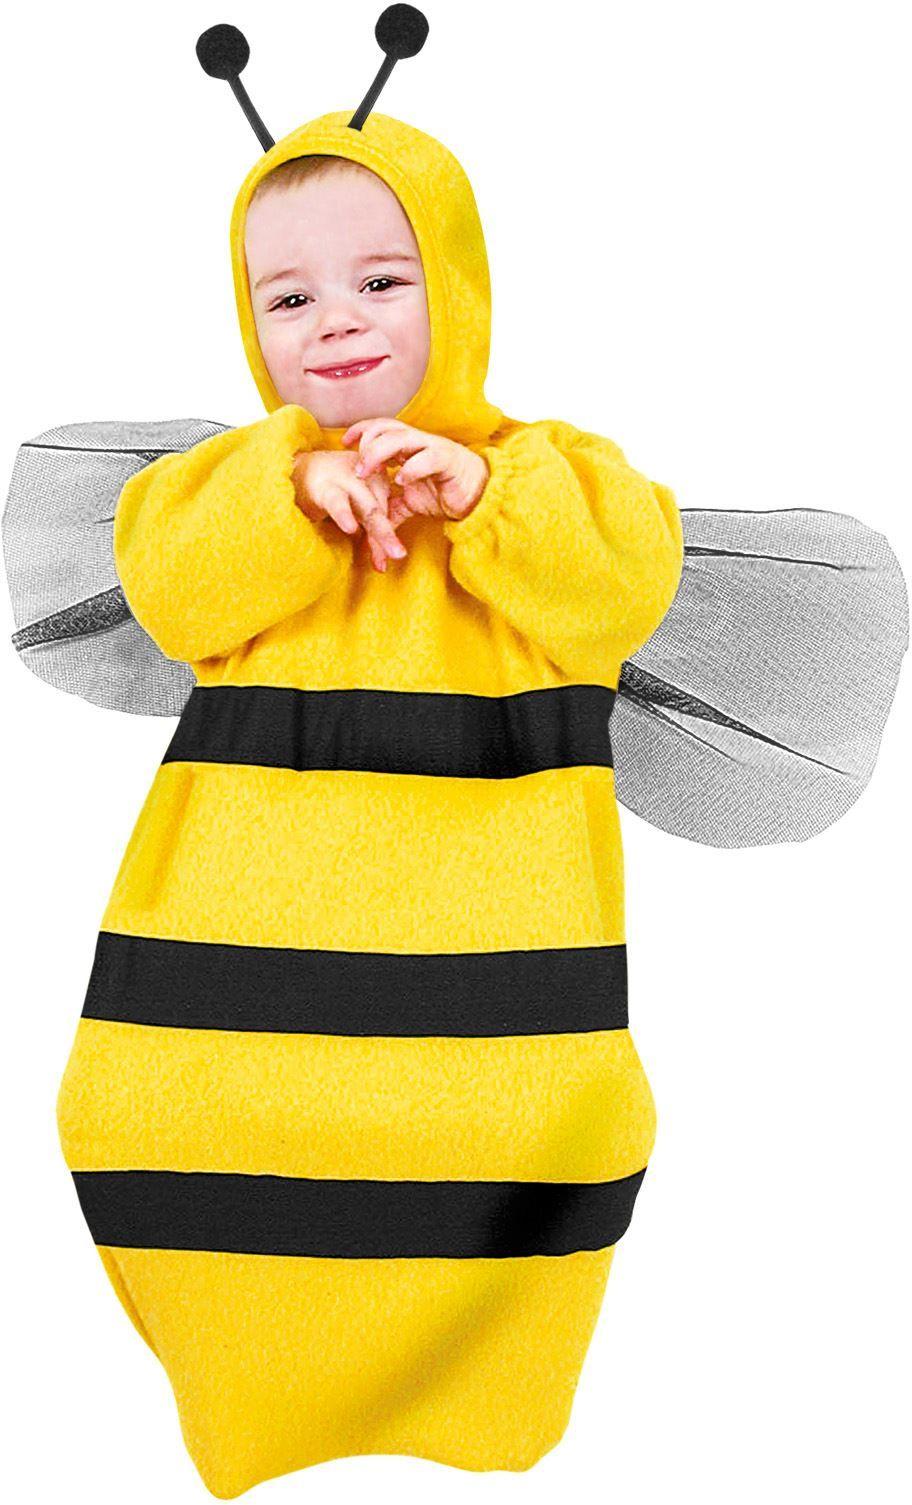 Bijen pakje baby